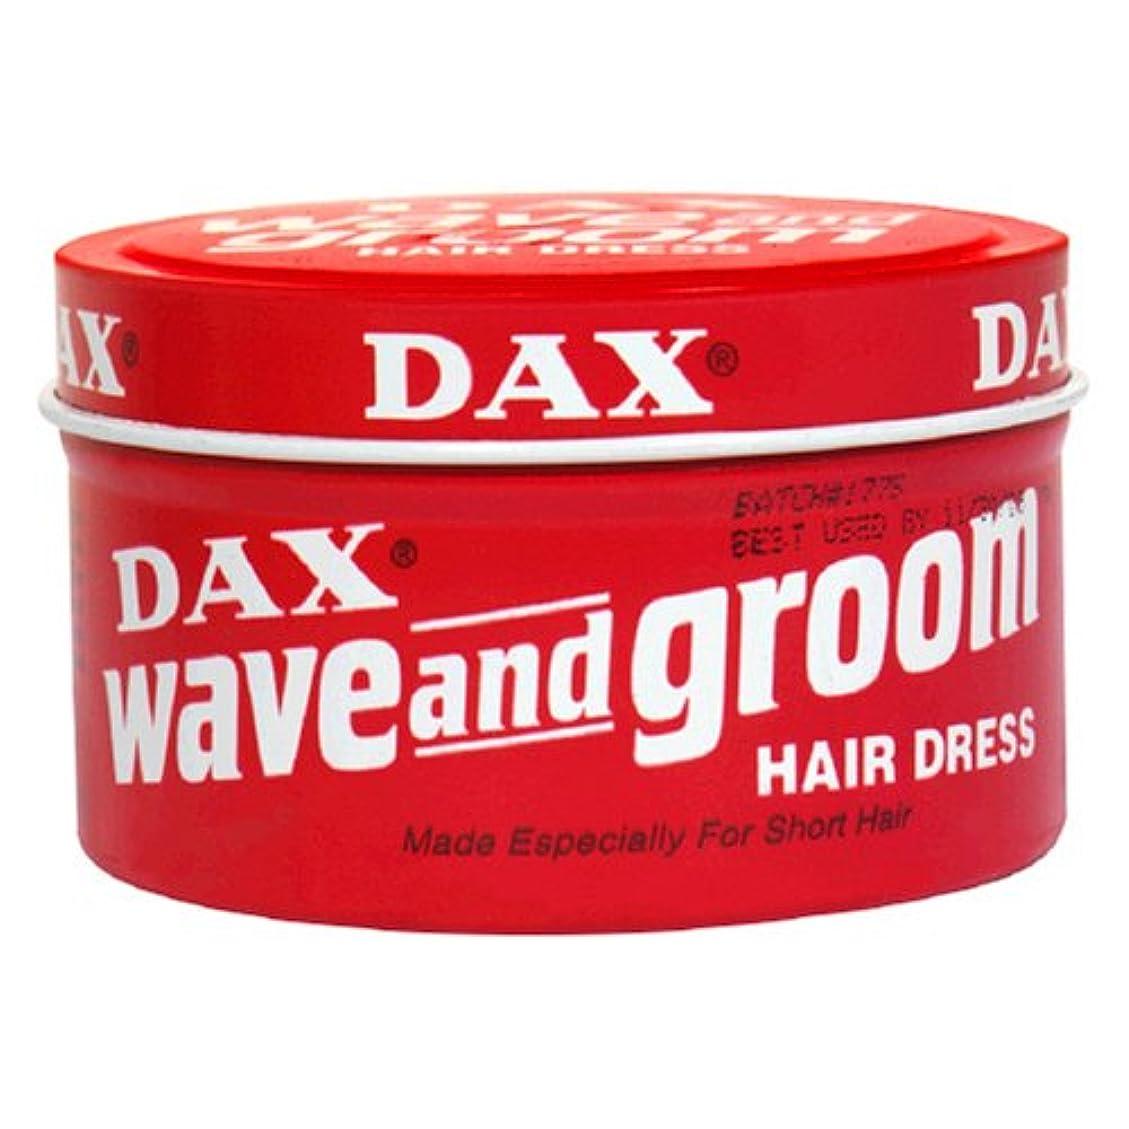 九月肉の治世Dax Wave & Groom Hair Dress 99 gm Jar (Case of 6) (並行輸入品)